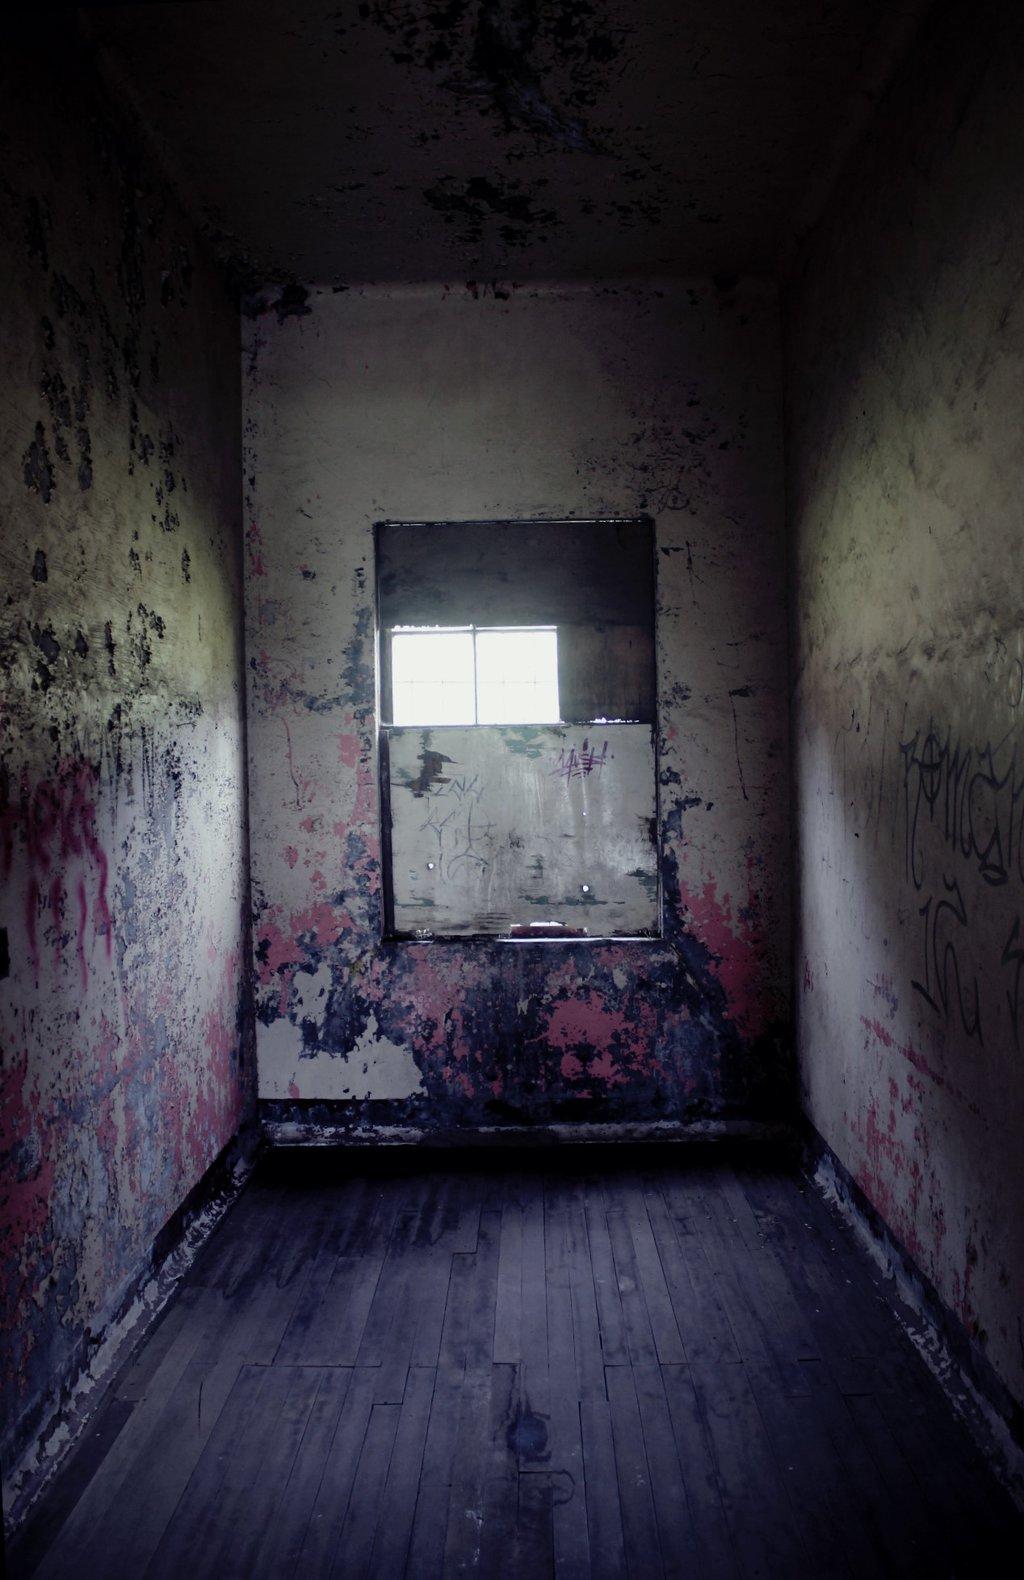 room_by_mimosaww-d6xbtgb